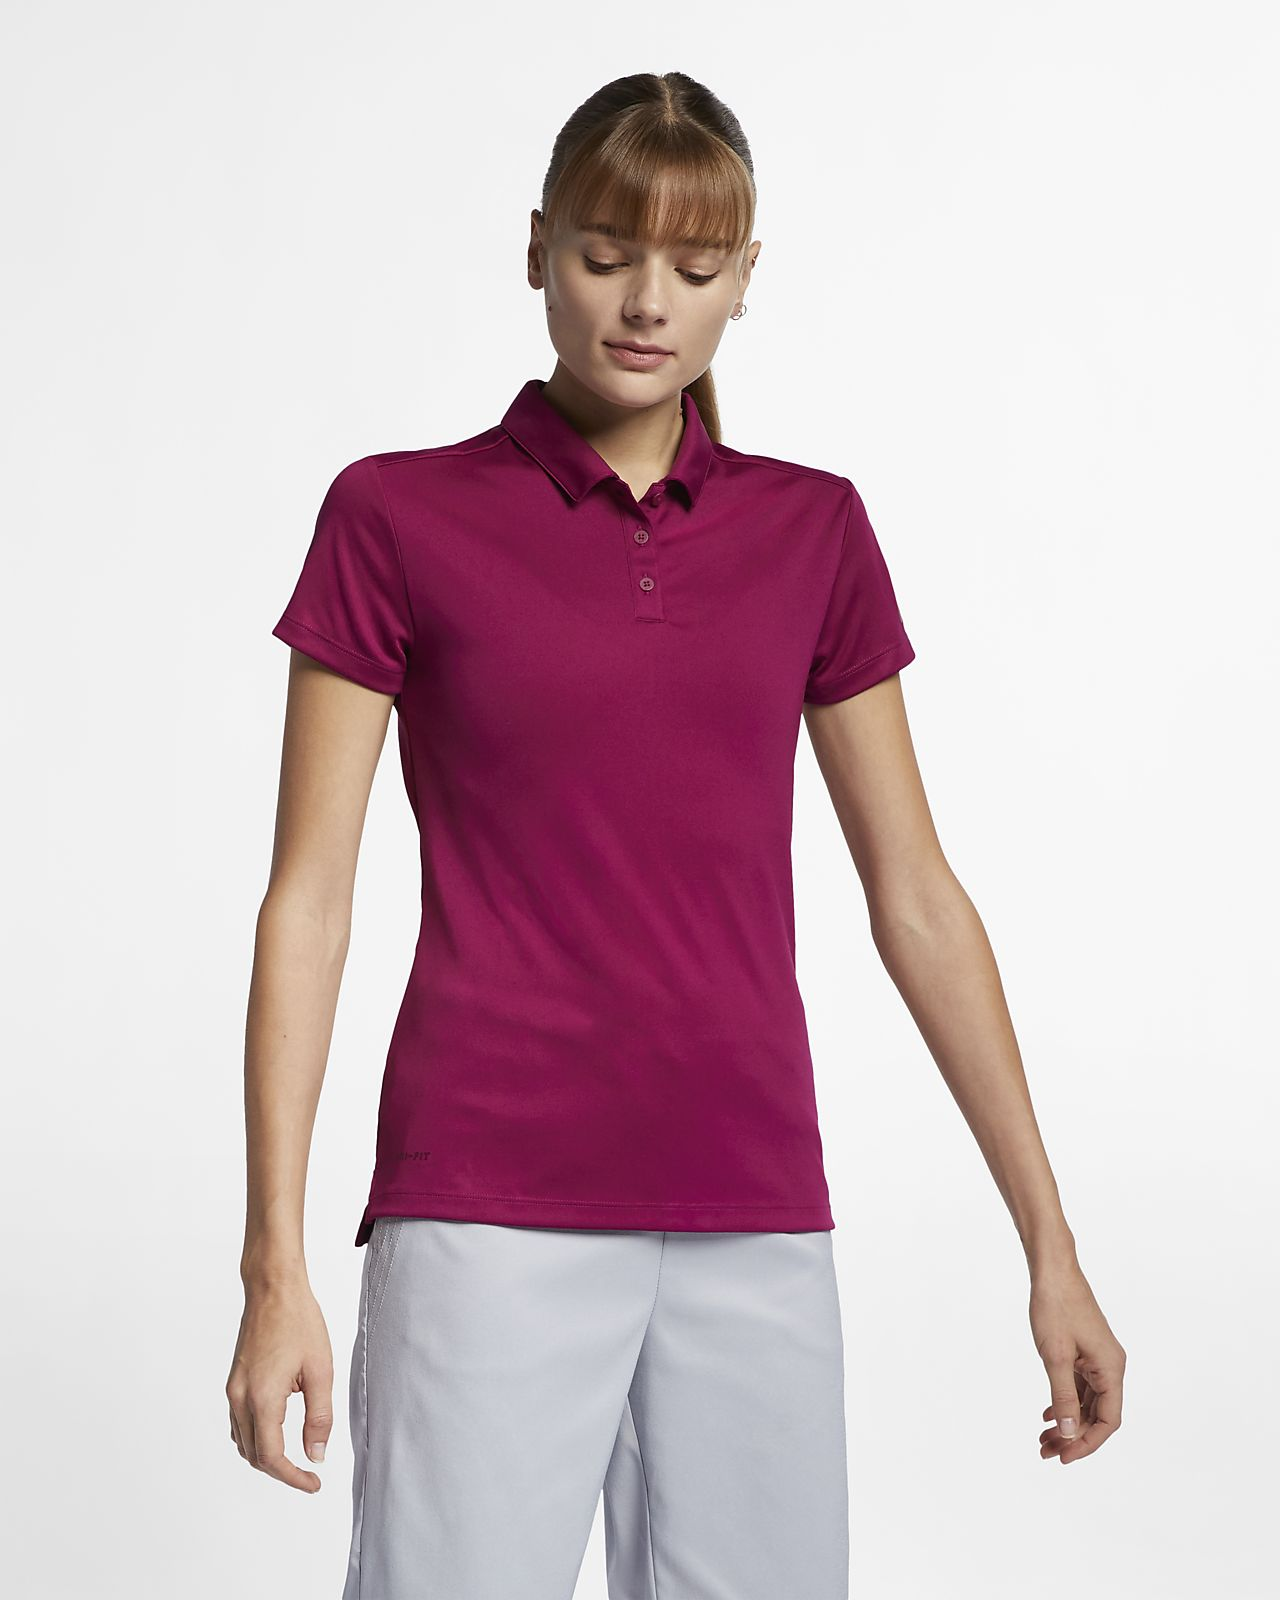 5ab704d8 Nike Dri-FIT Women's Golf Polo. Nike.com IE